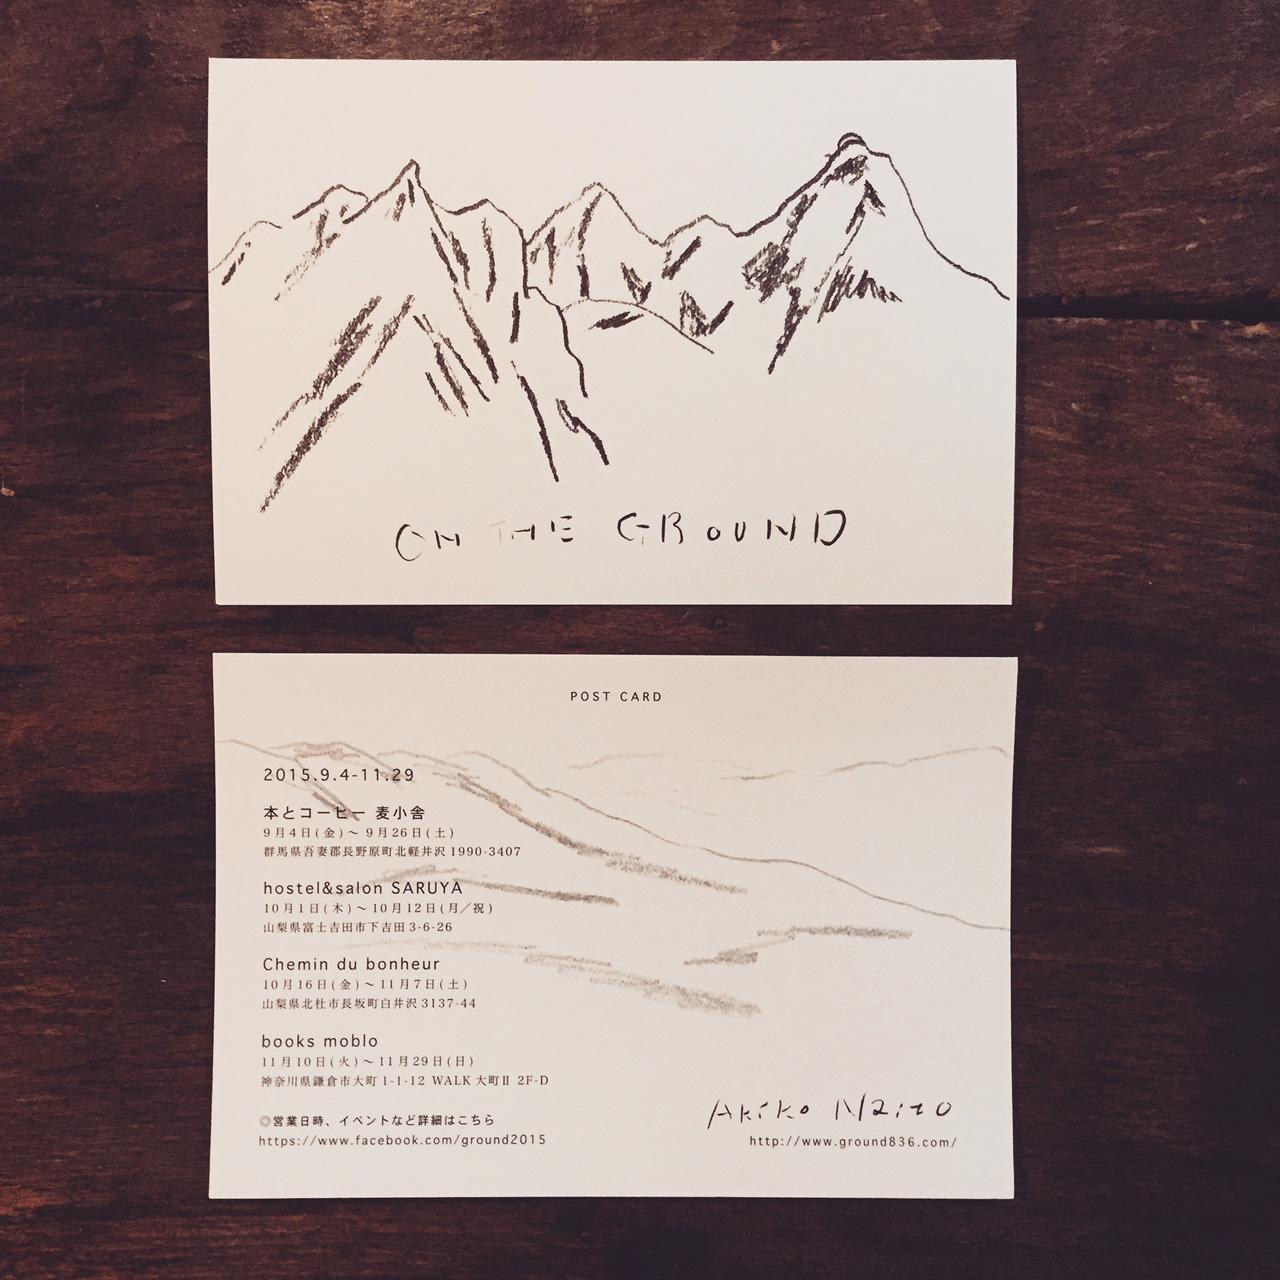 Akiko Naito 巡回展 | ON THE GROUND_d0028589_10263055.jpg